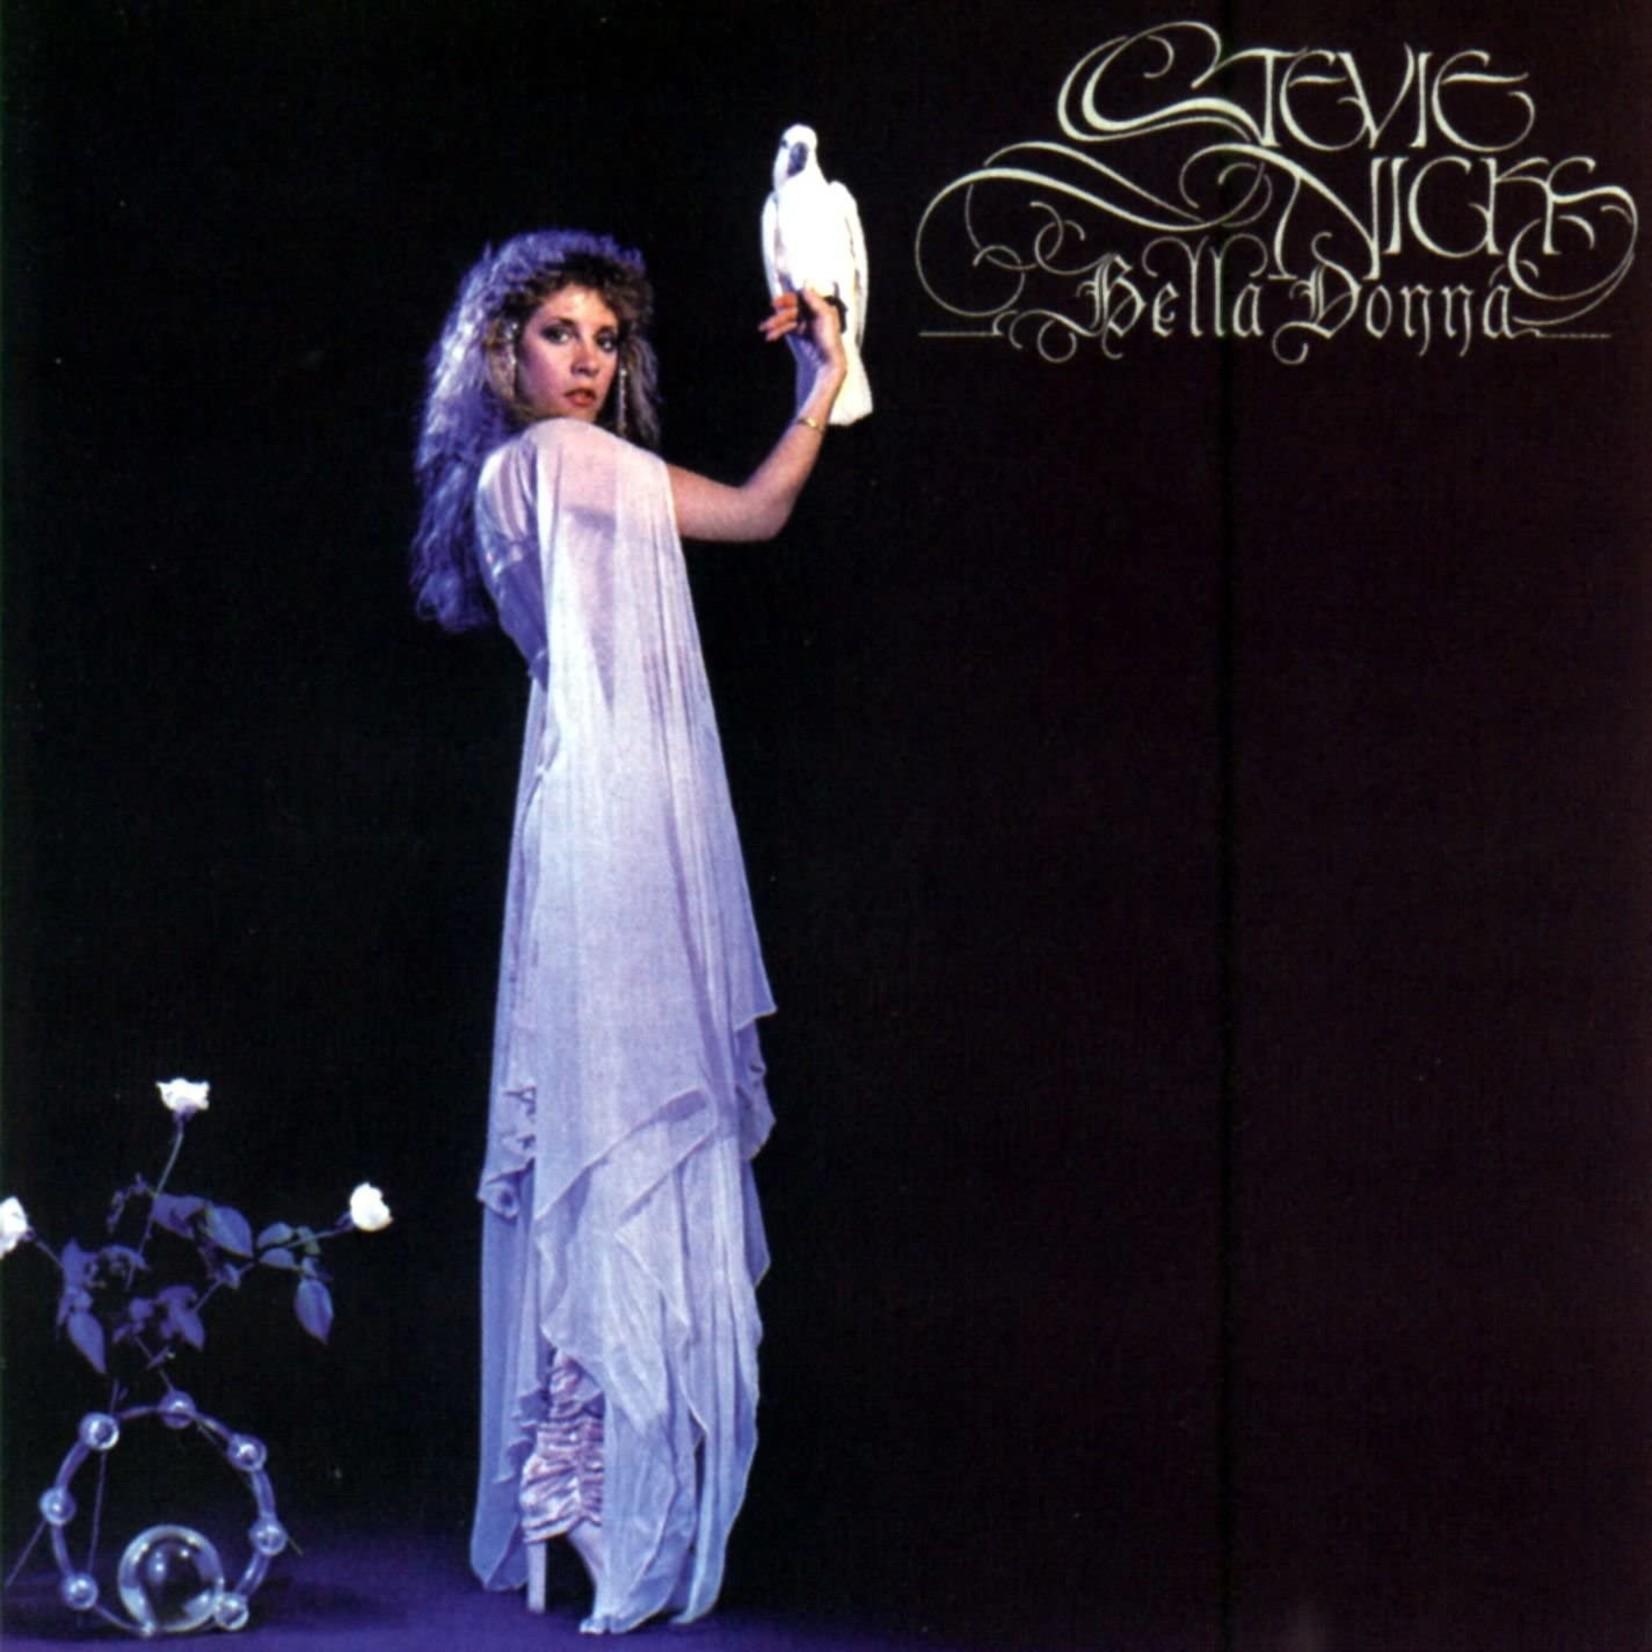 [Vintage] Nicks, Stevie (Fleetwood Mac): Bella Donna